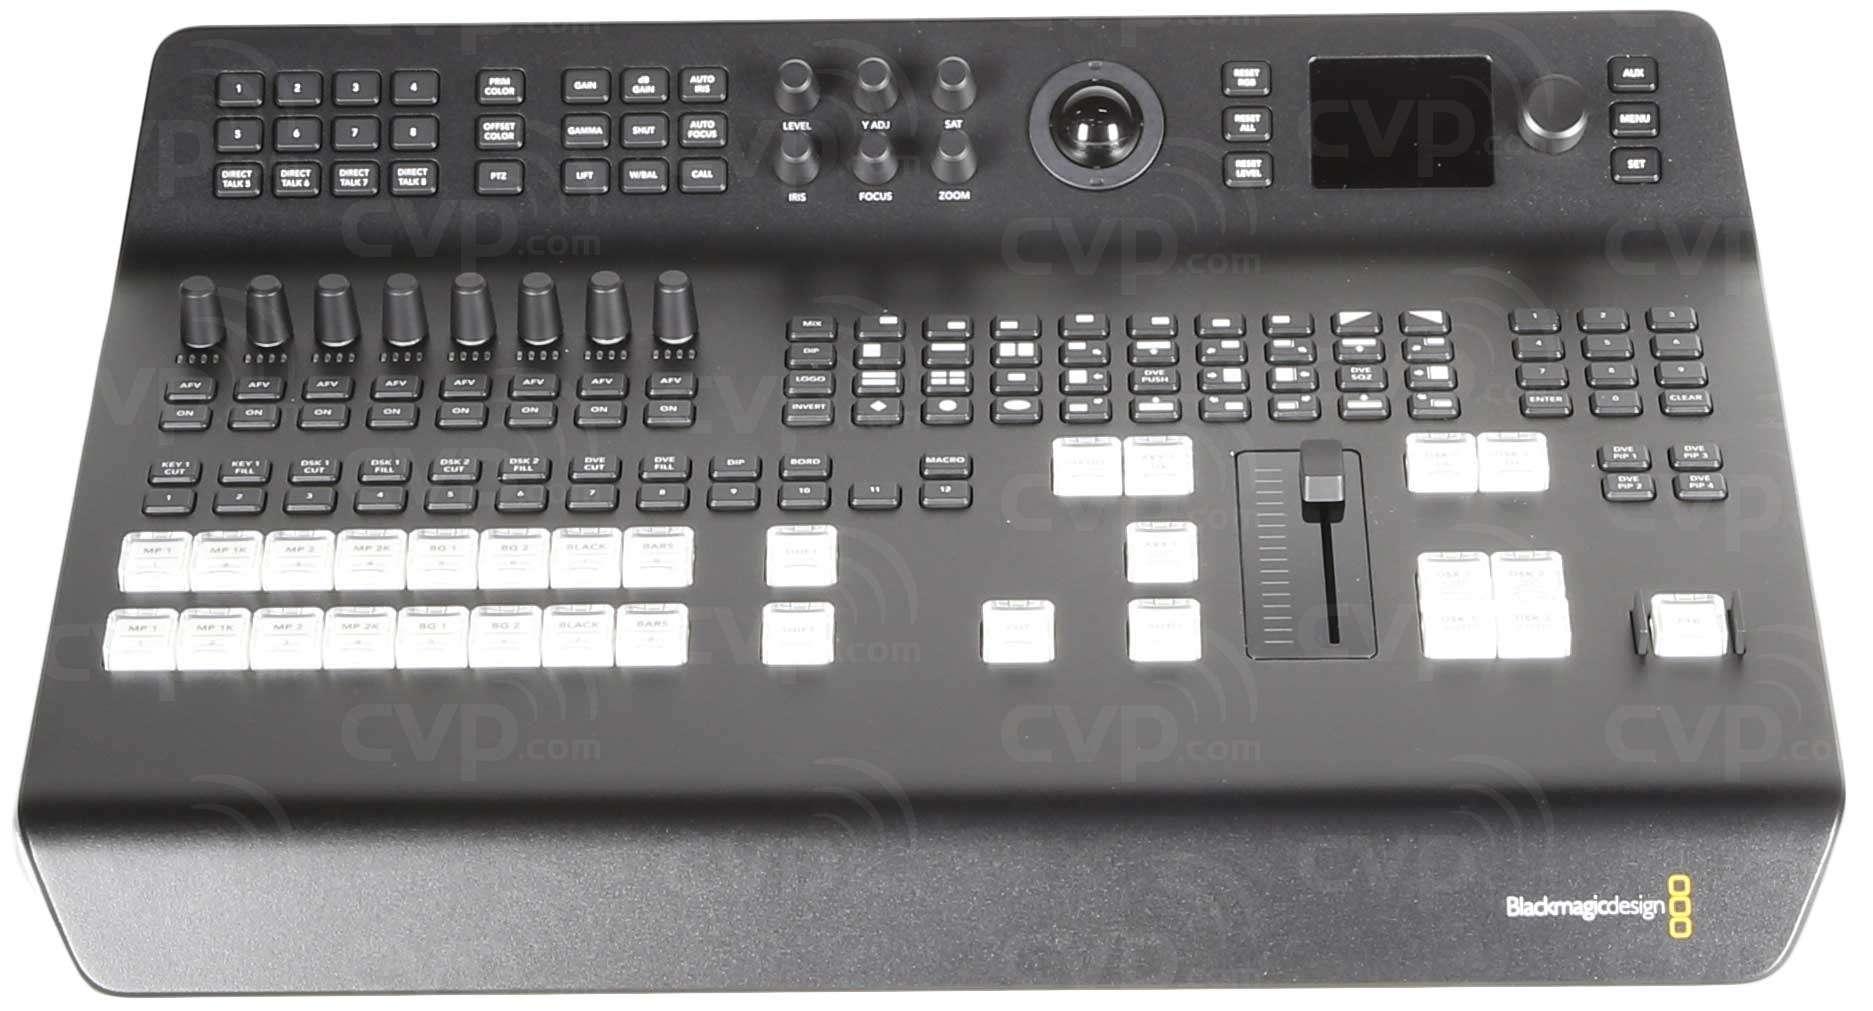 Blackmagic Design Atem Television Studio Hd When Are Thay Shipping